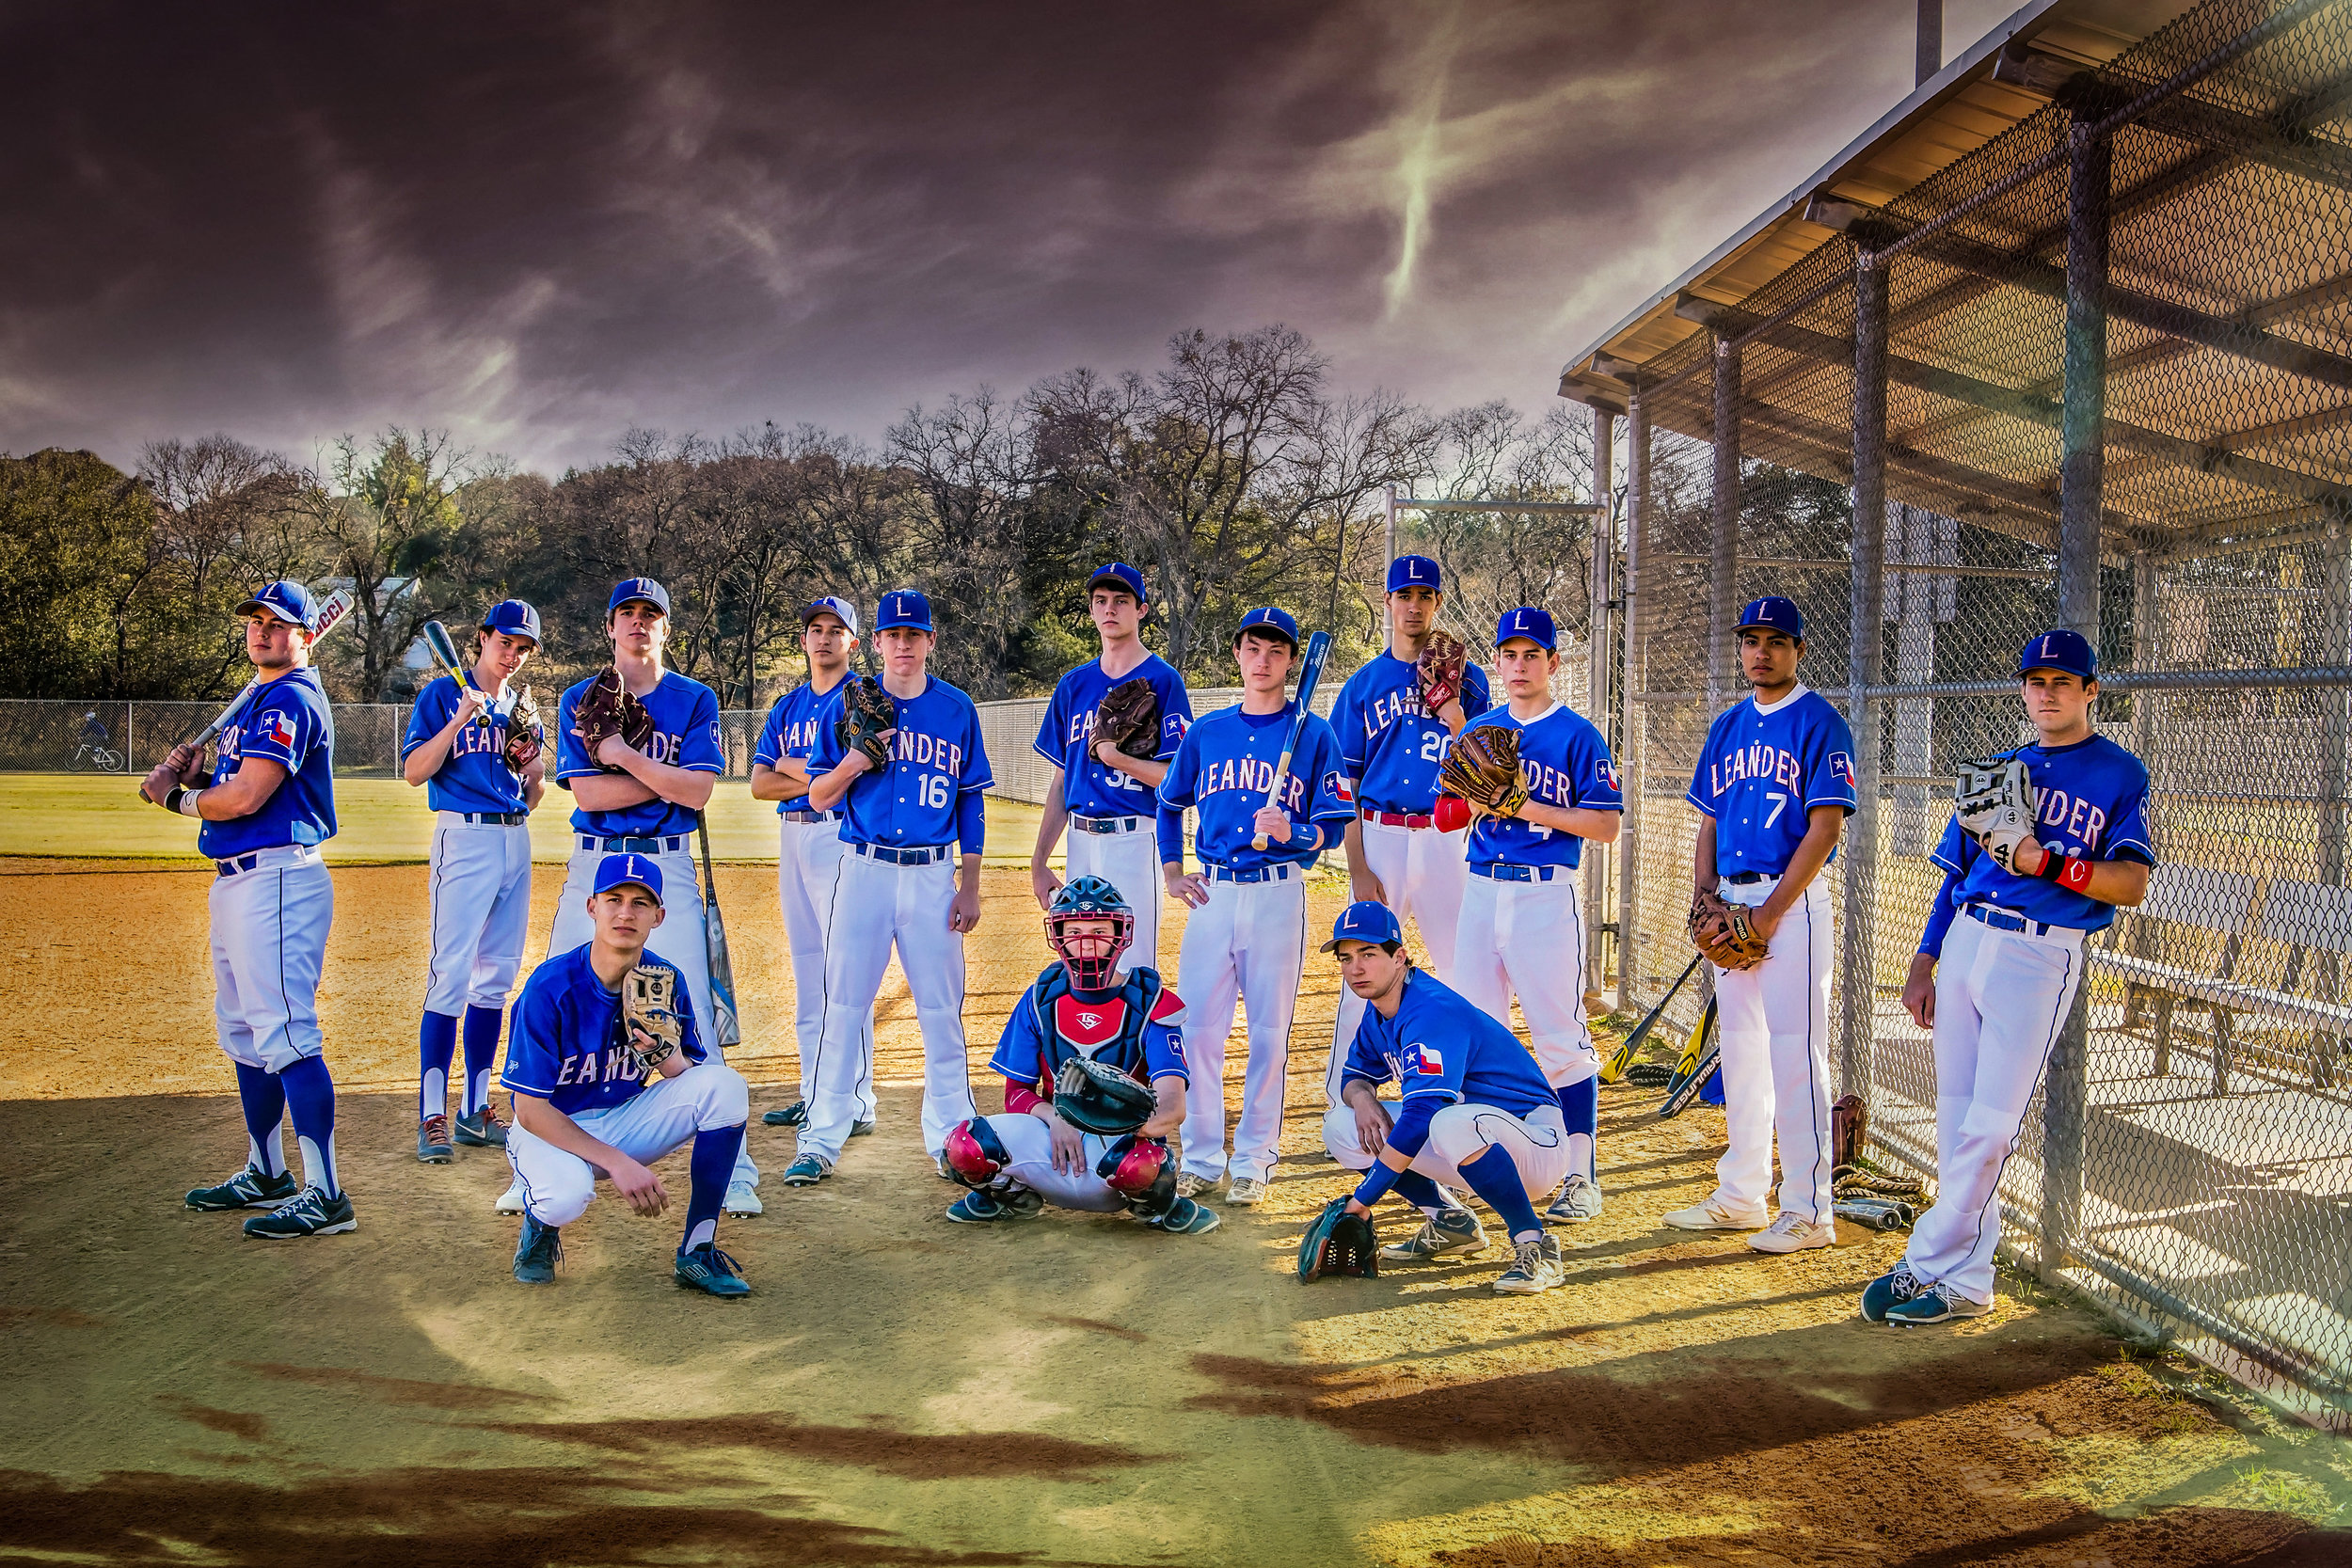 Leander High Baseball